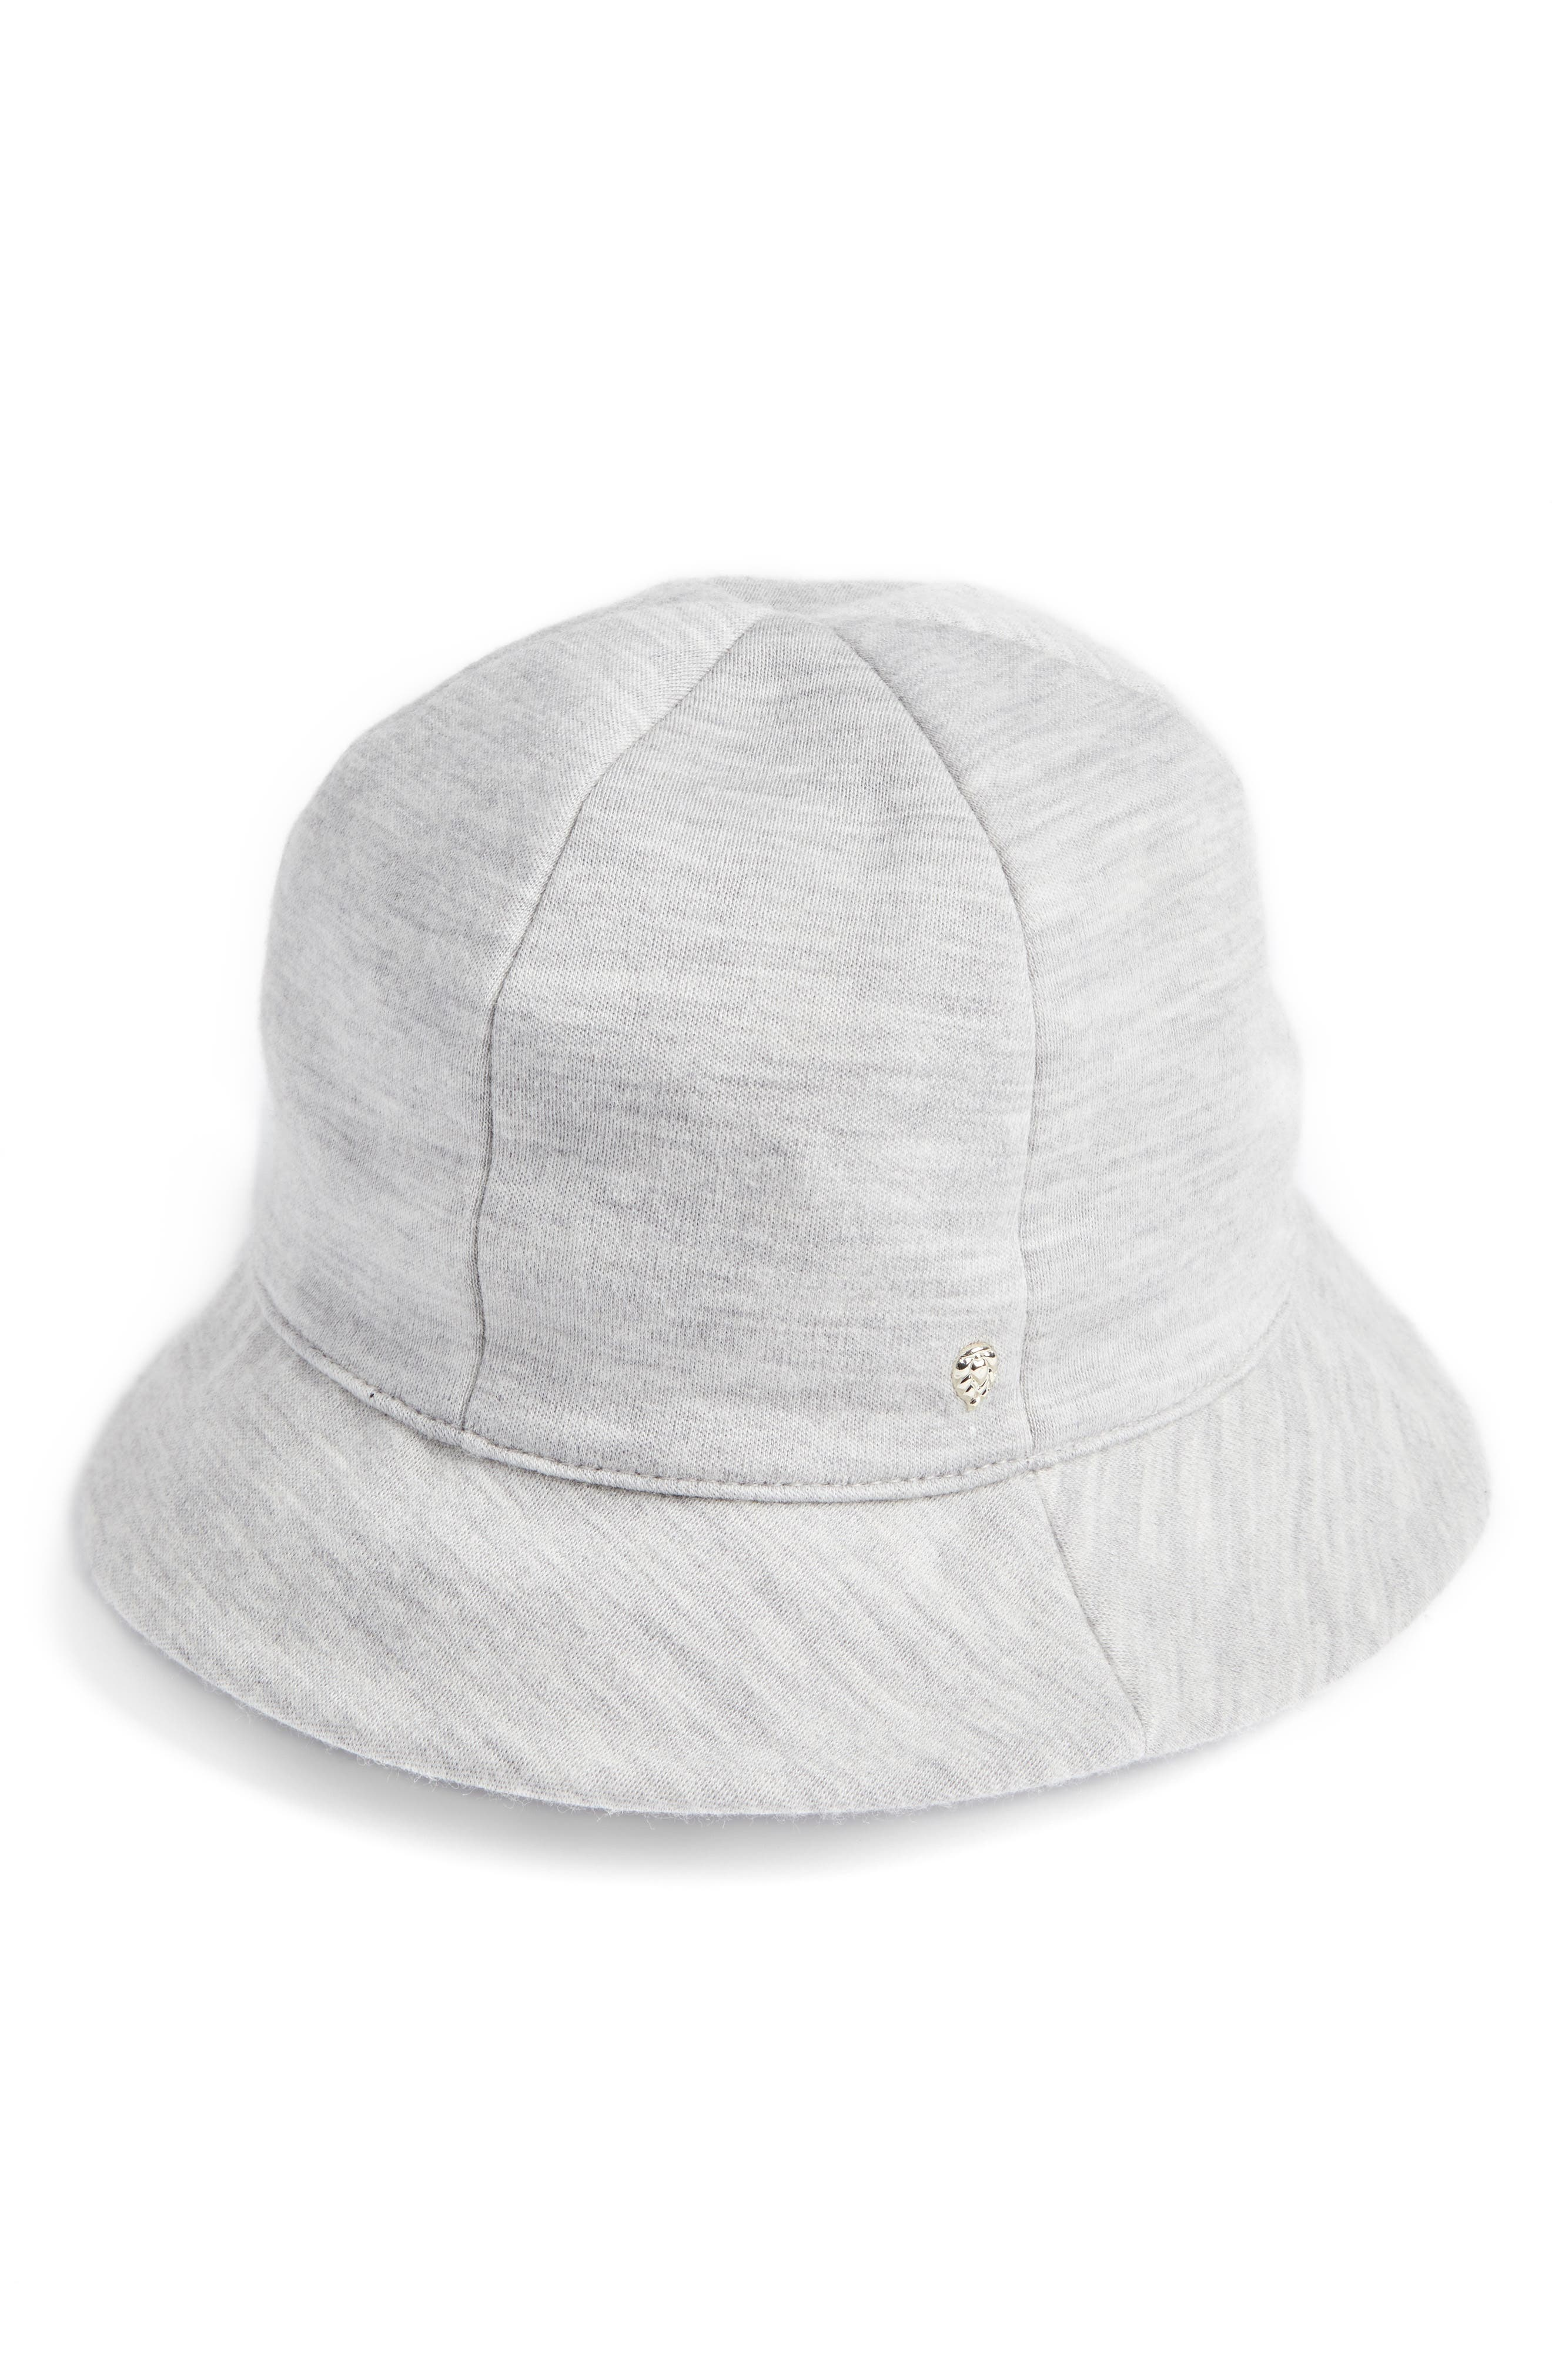 Alternate Image 1 Selected - Helen Kaminski Merino Wool Jersey Bucket Hat